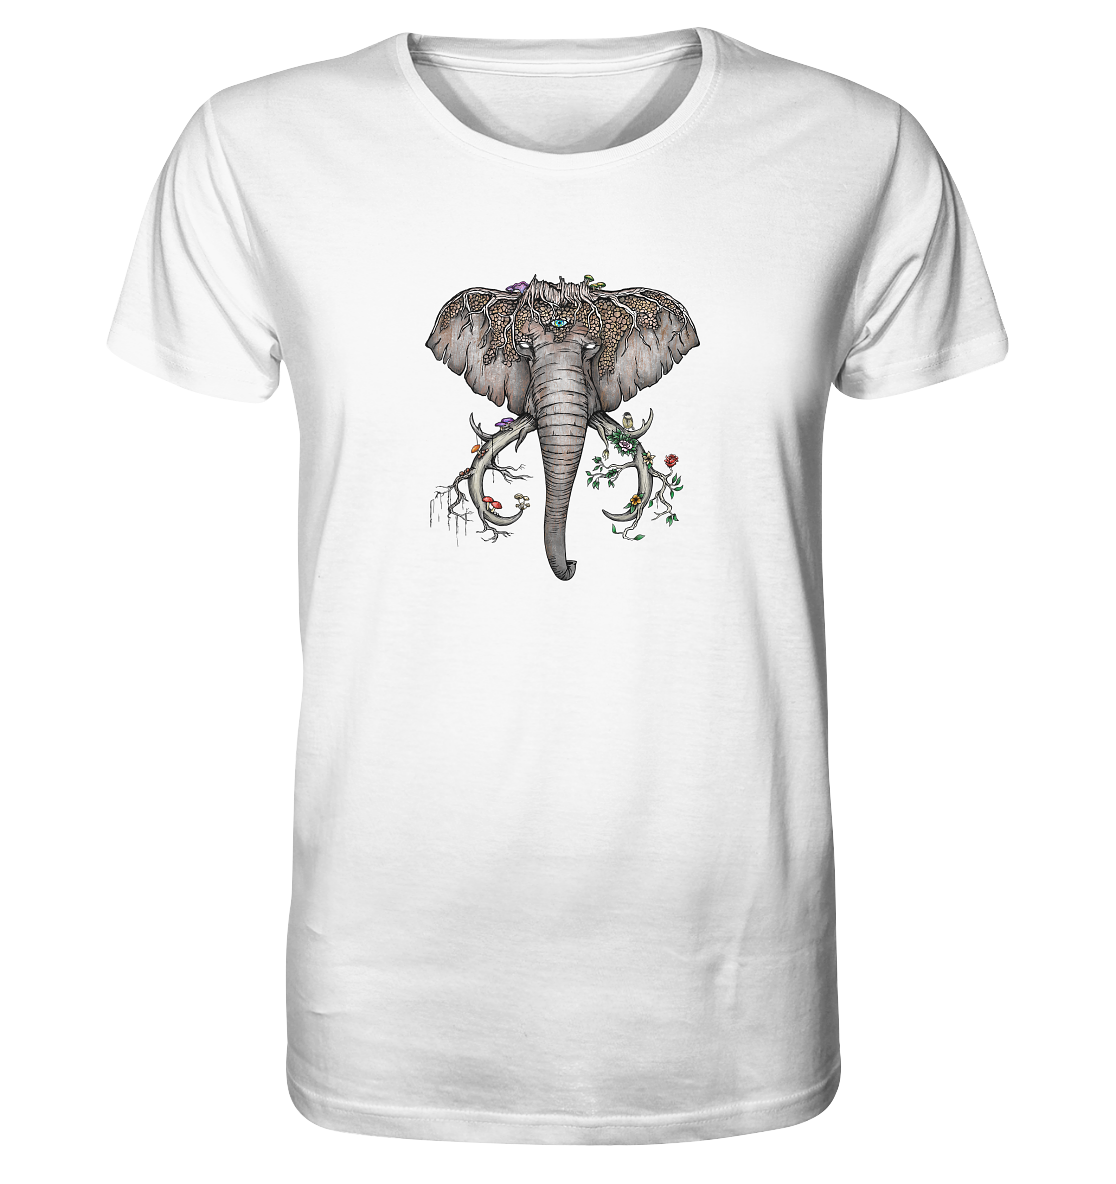 front-organic-shirt-f8f8f8-1116x-2.png